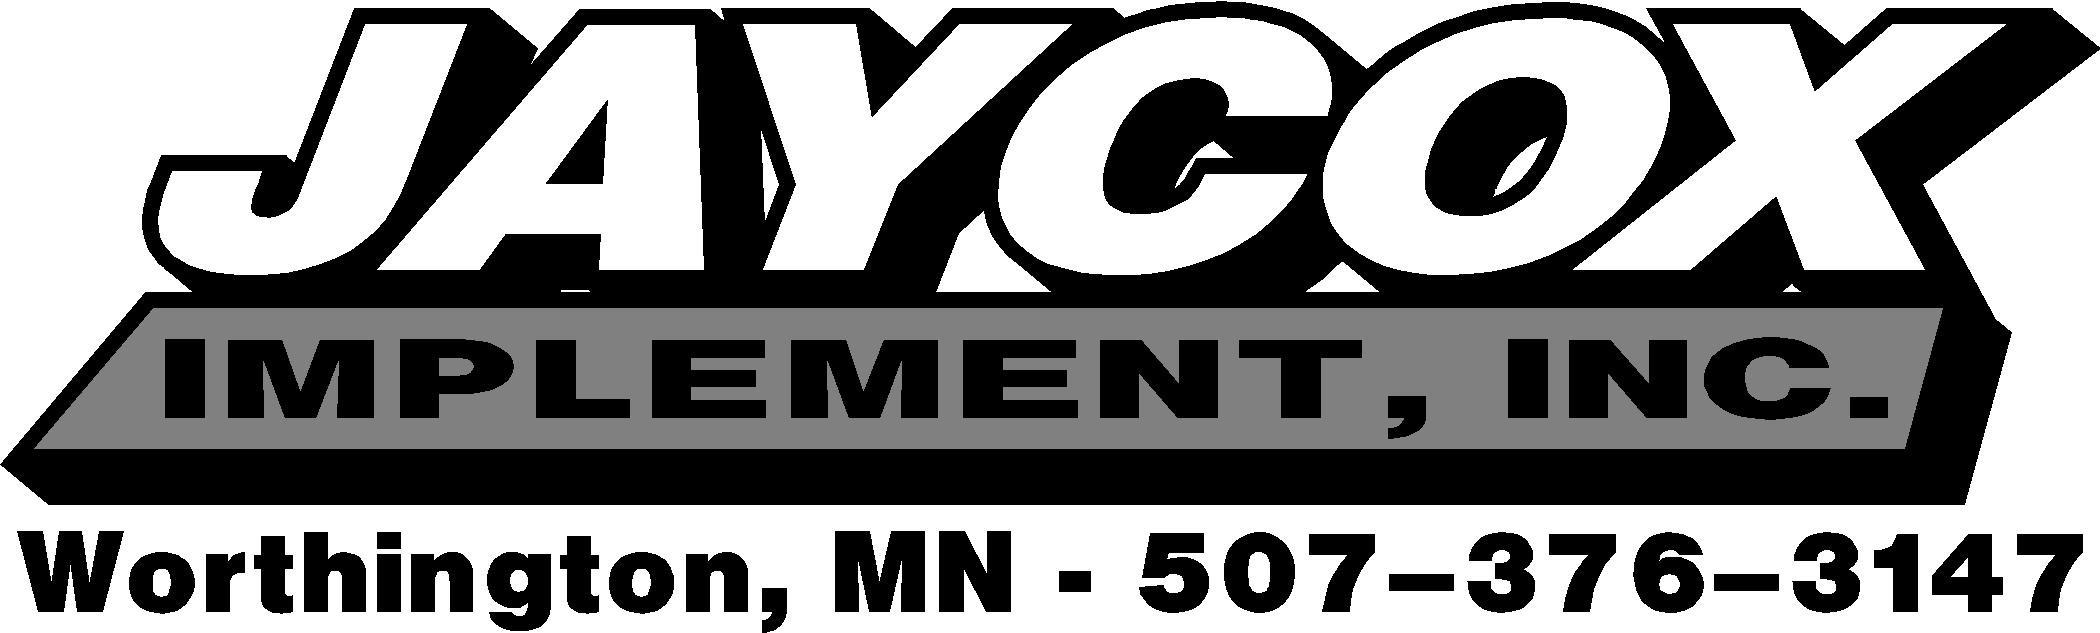 Jaycox Implement Inc